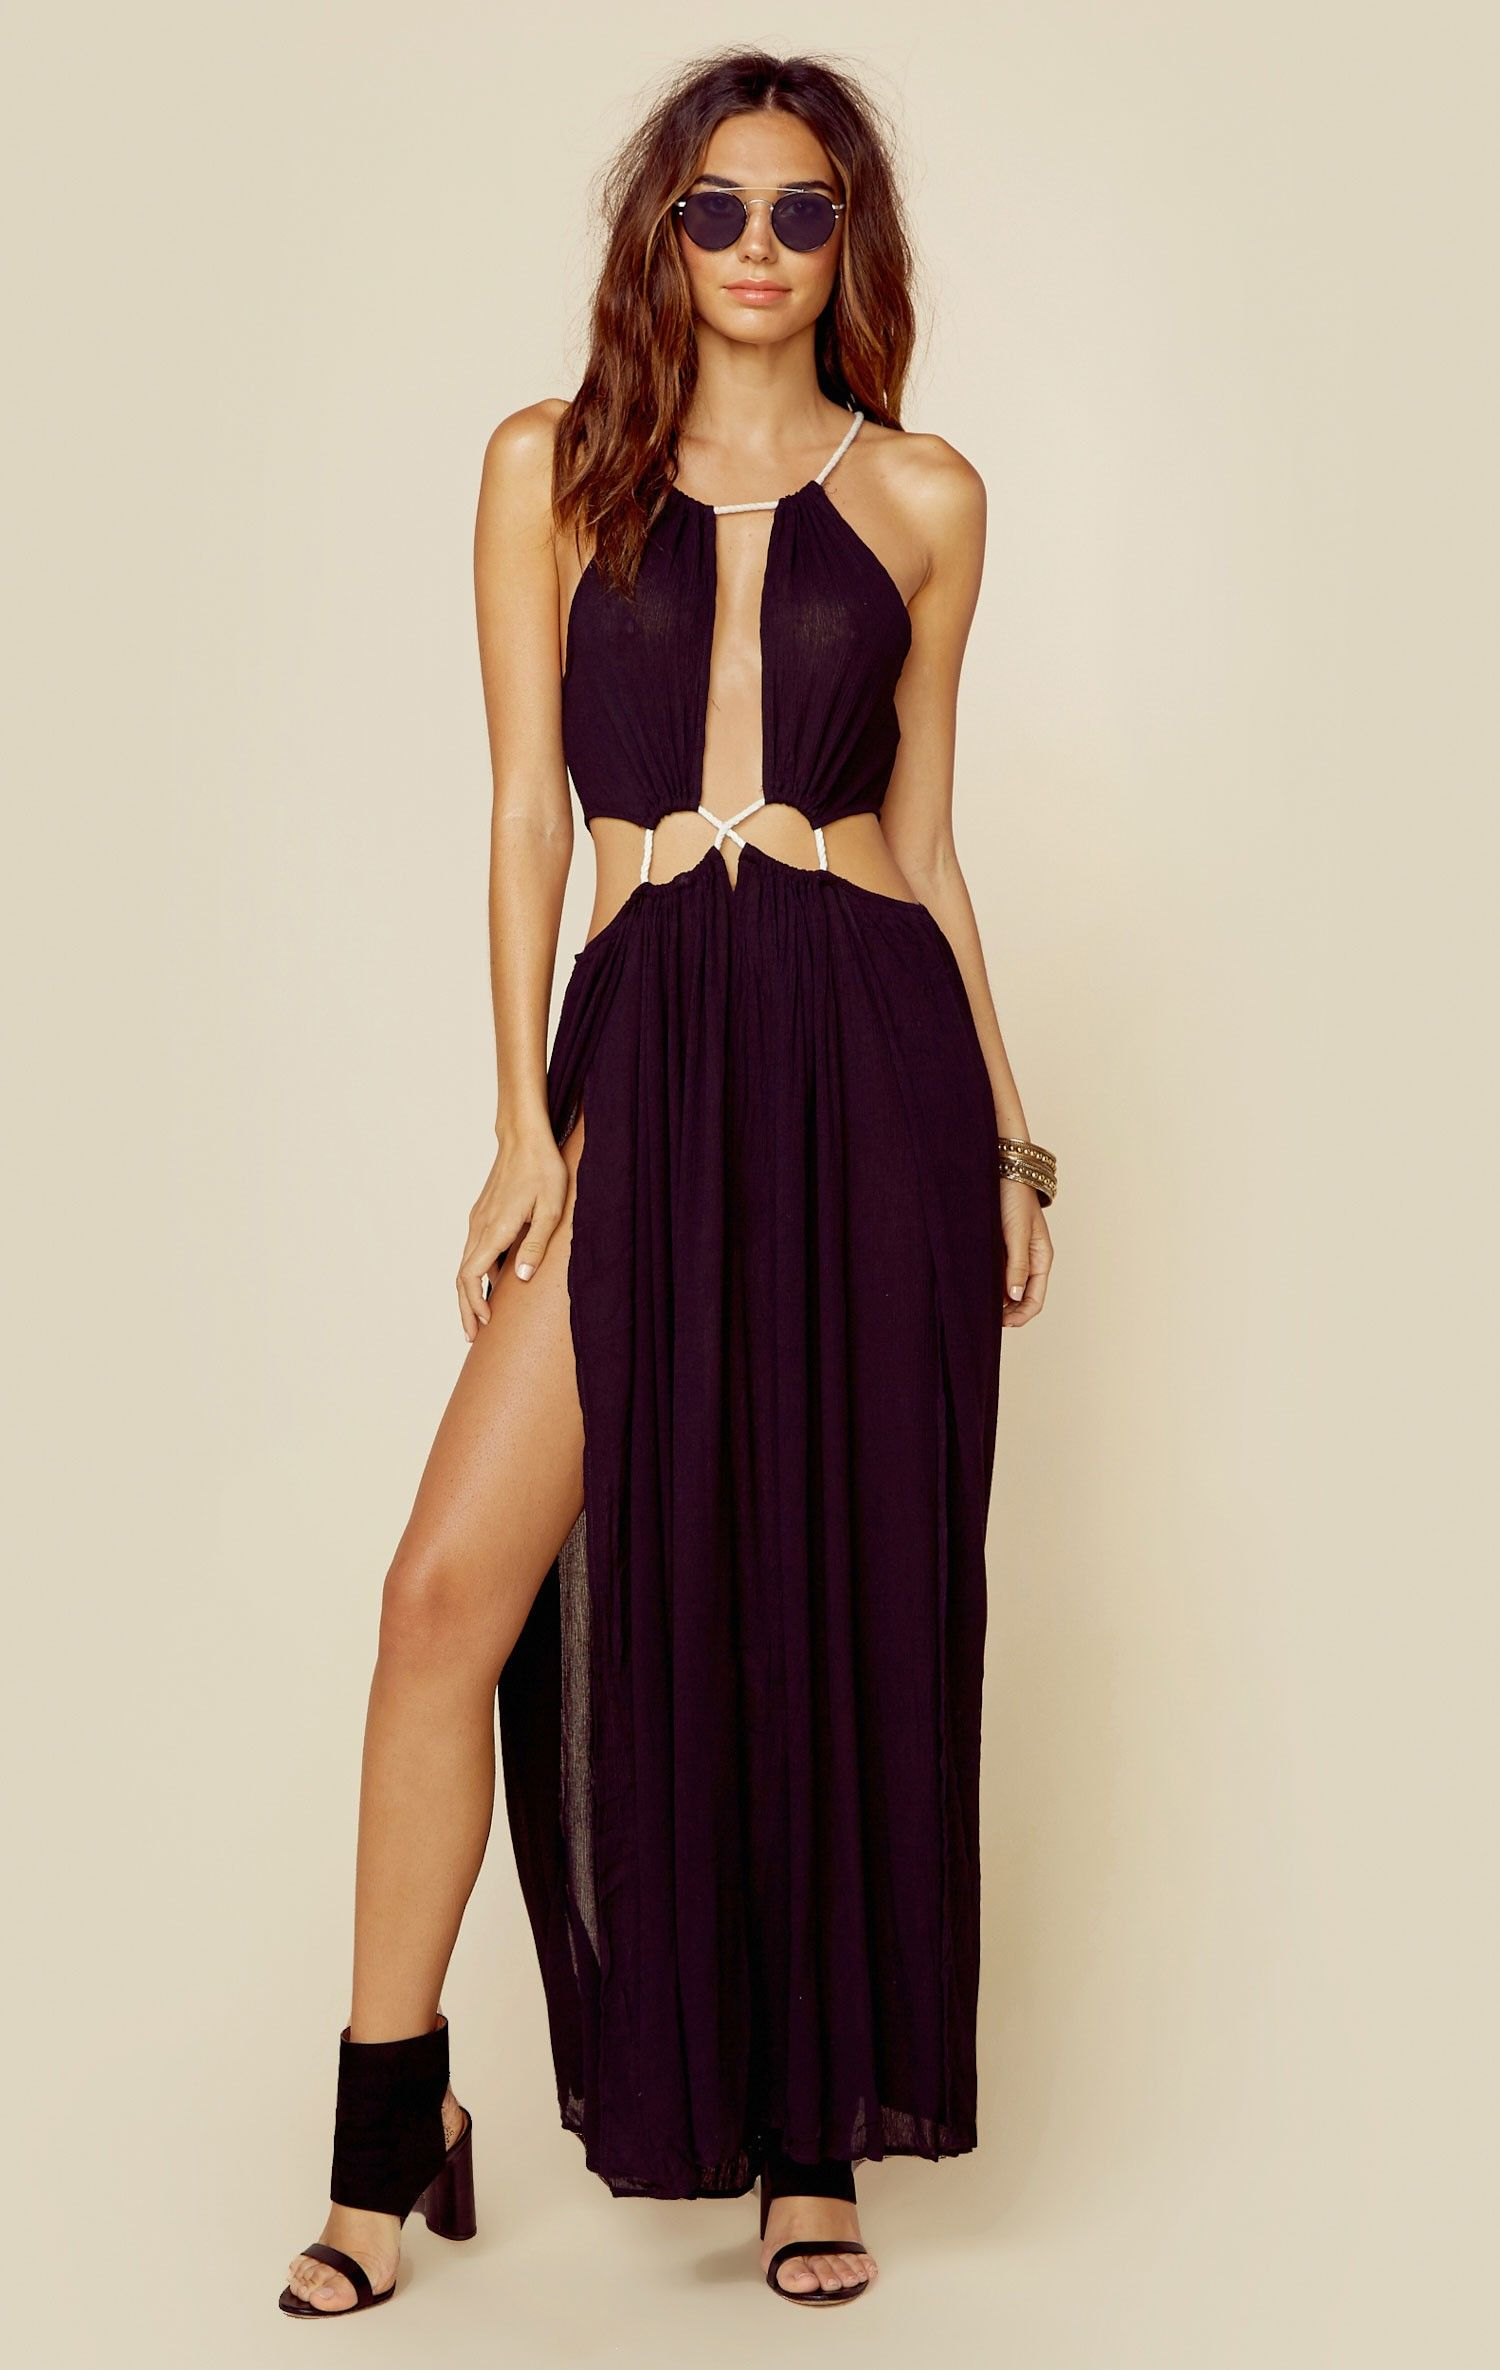 0d1fb71e12f7 Palm springs maxi dress